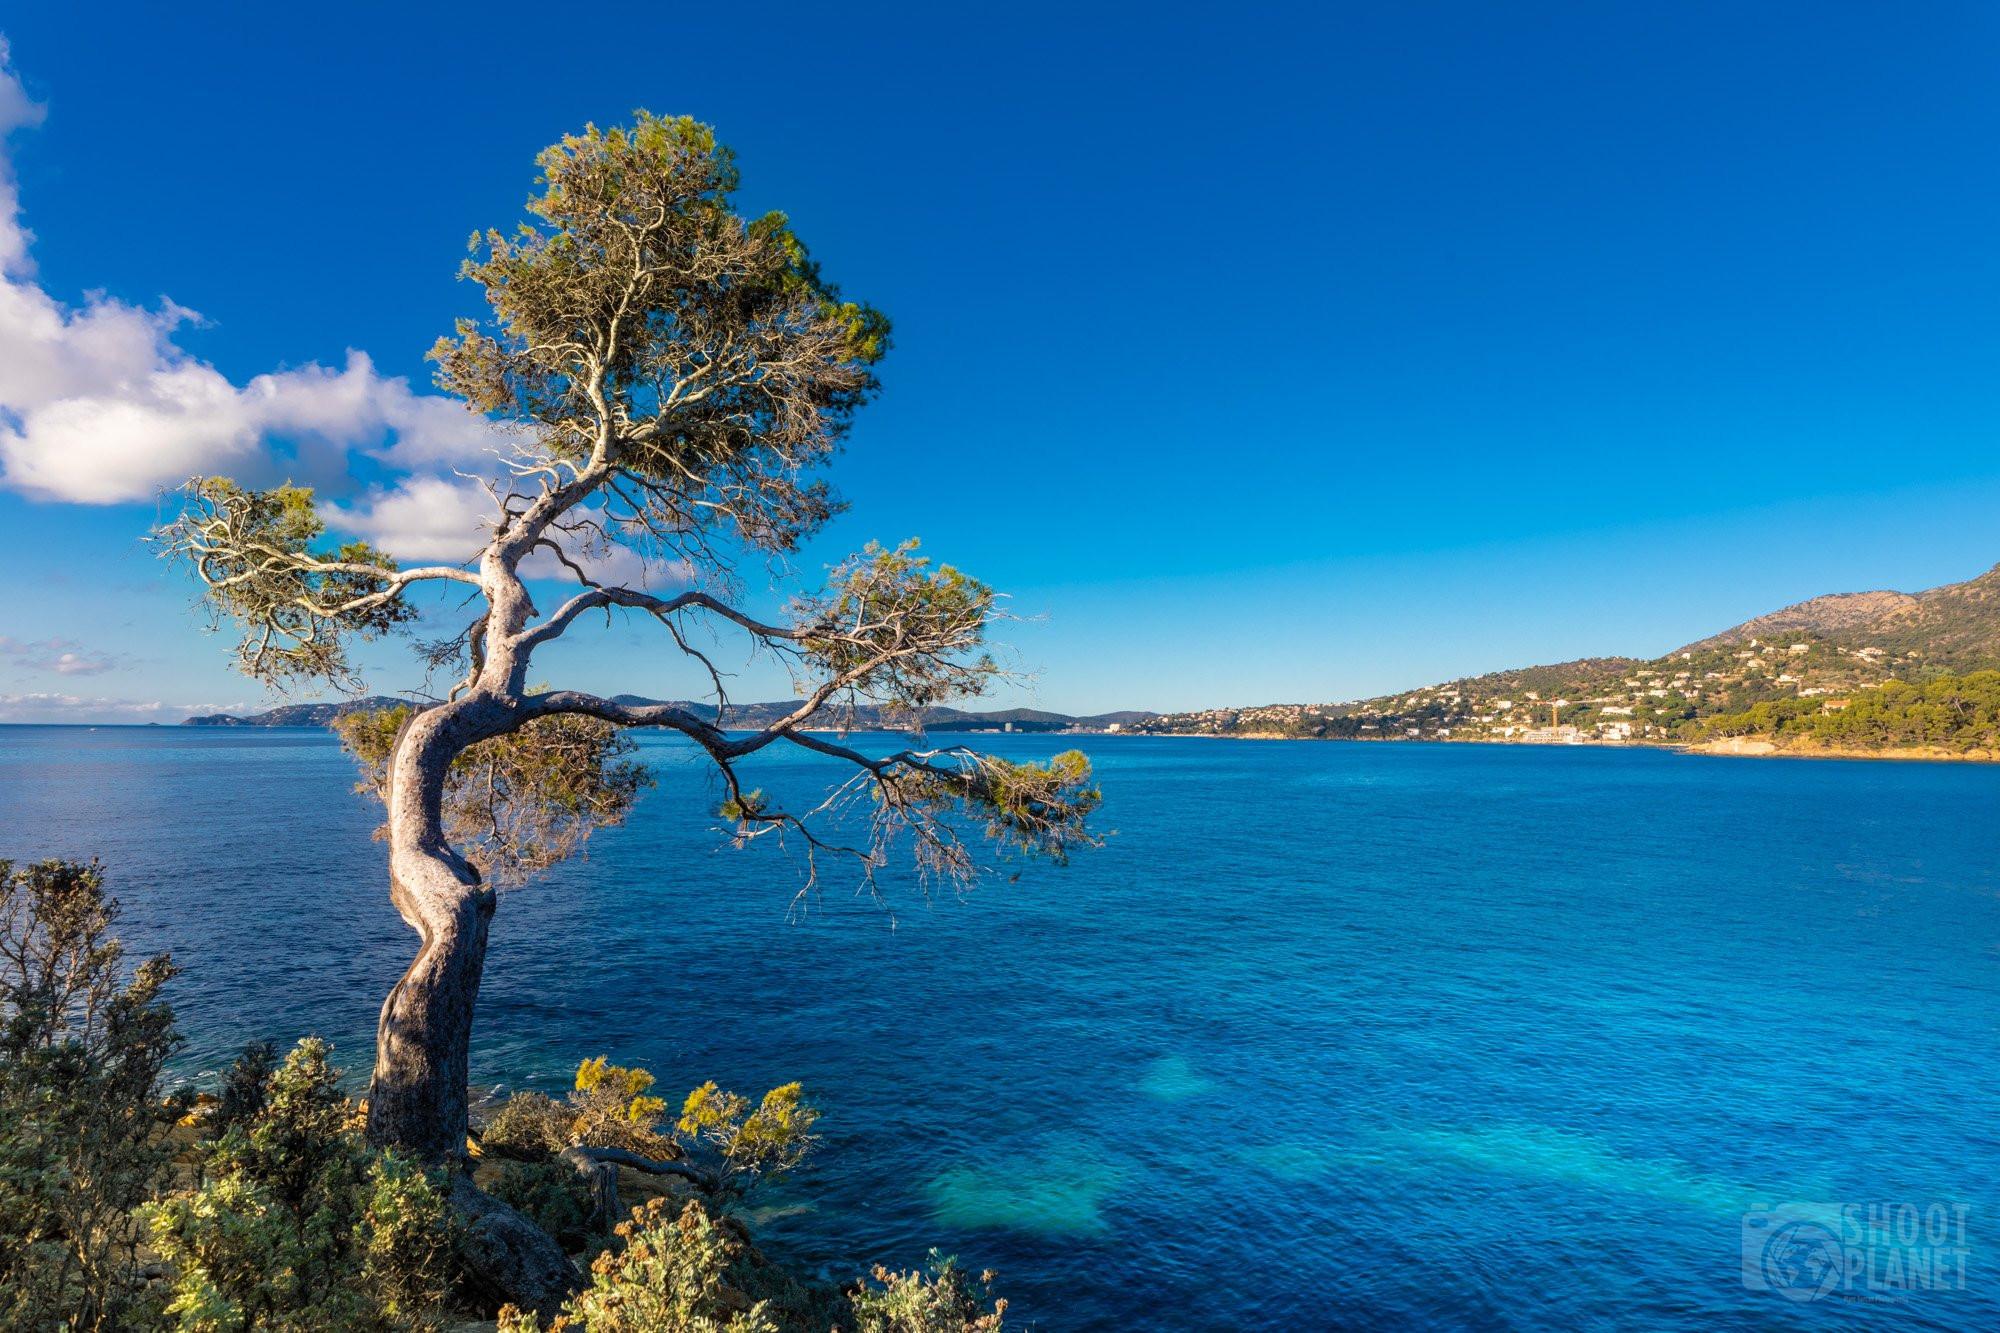 Pointe du layet seascape, Azure coast France